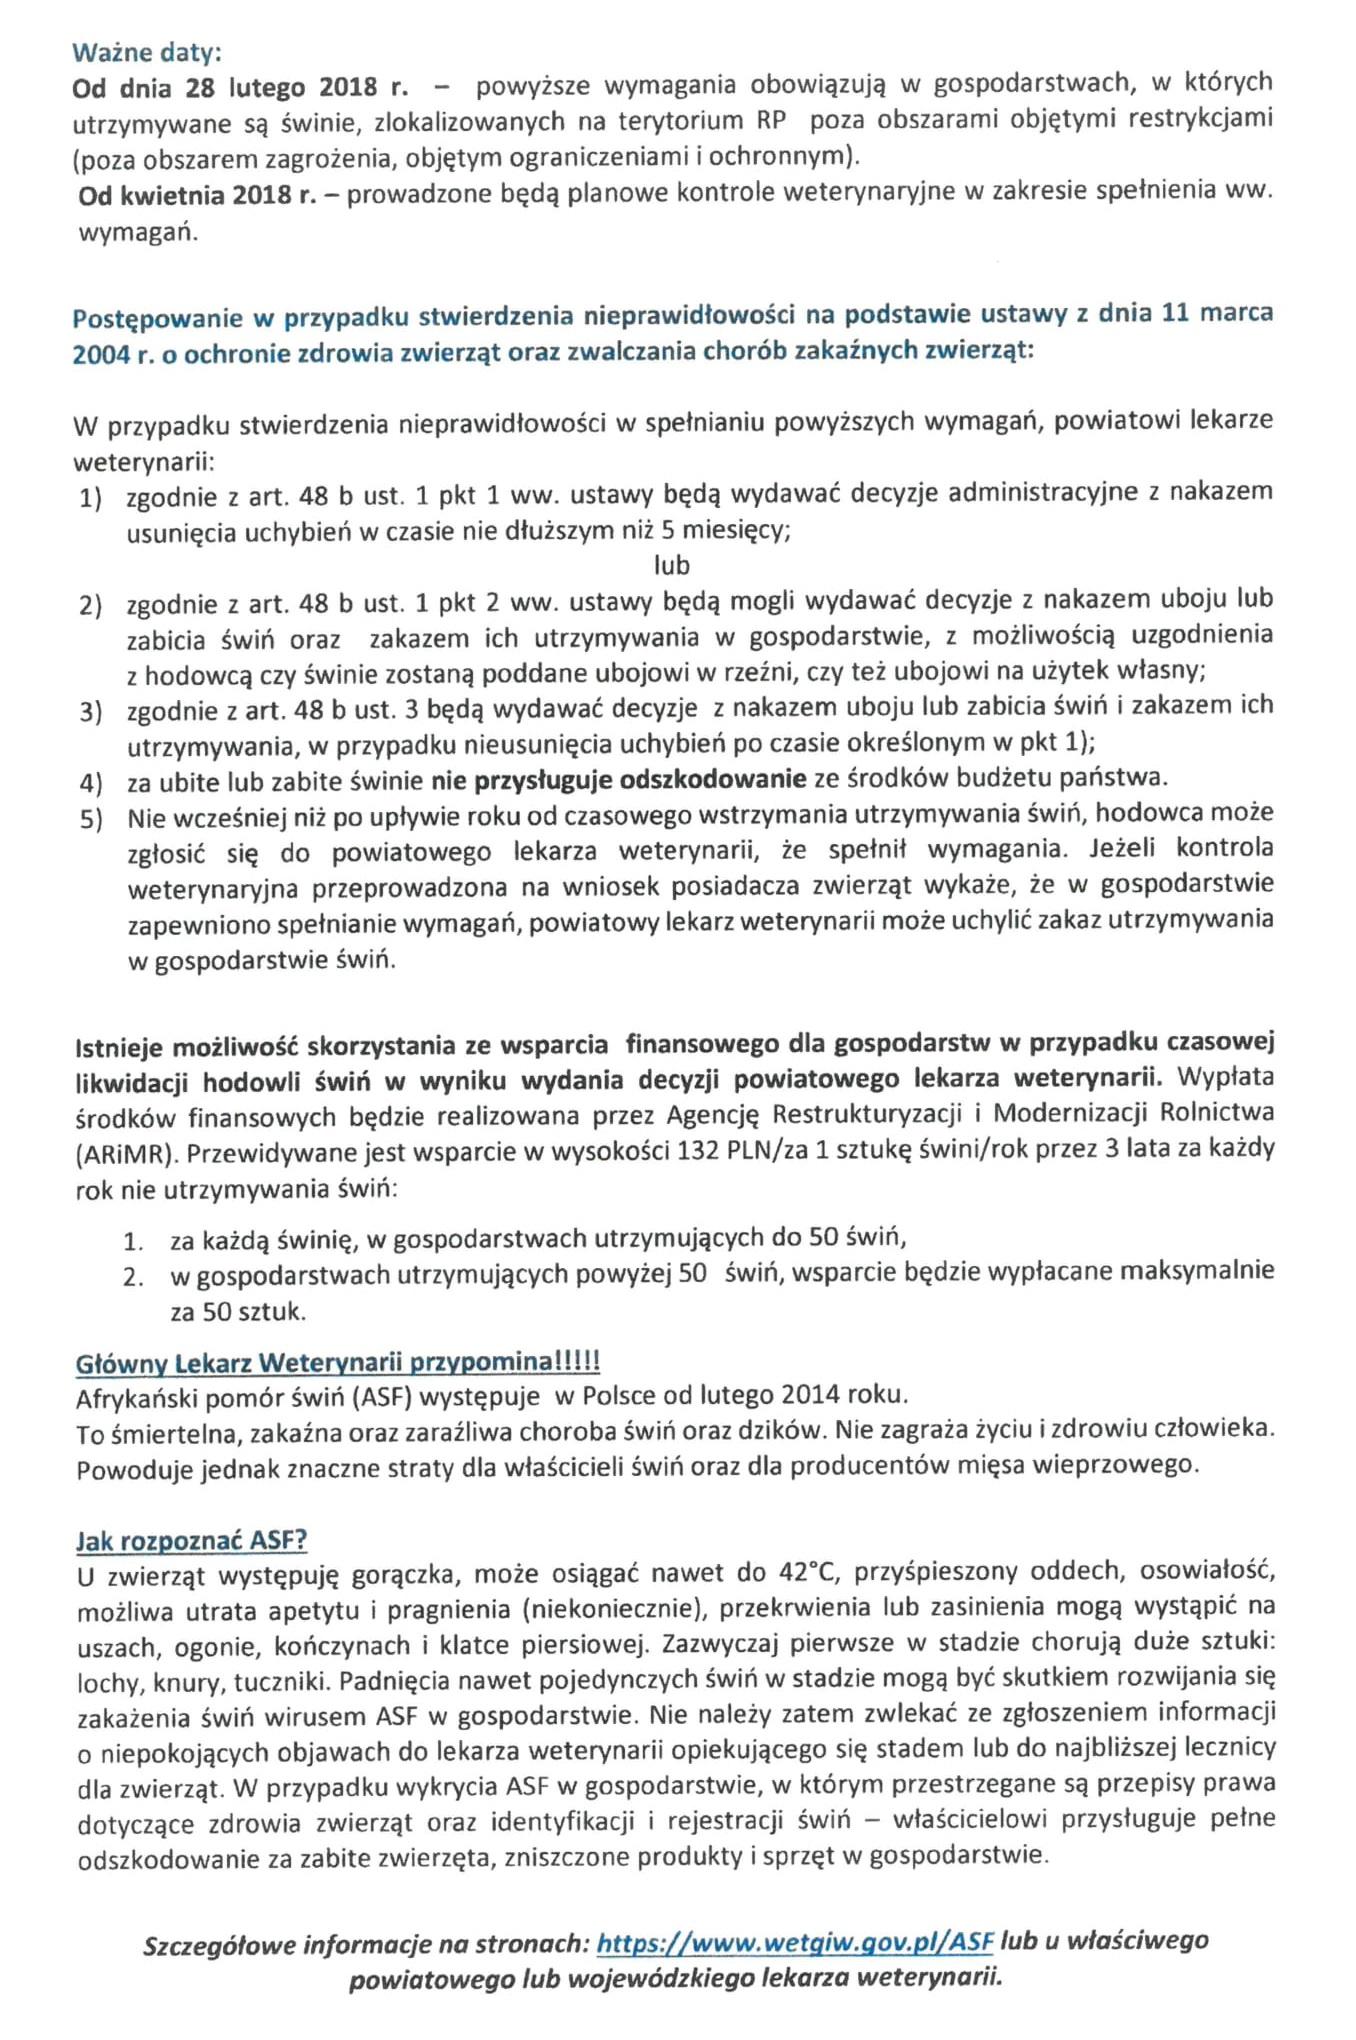 Informacje nt. ASF-2.jpg (700 KB)